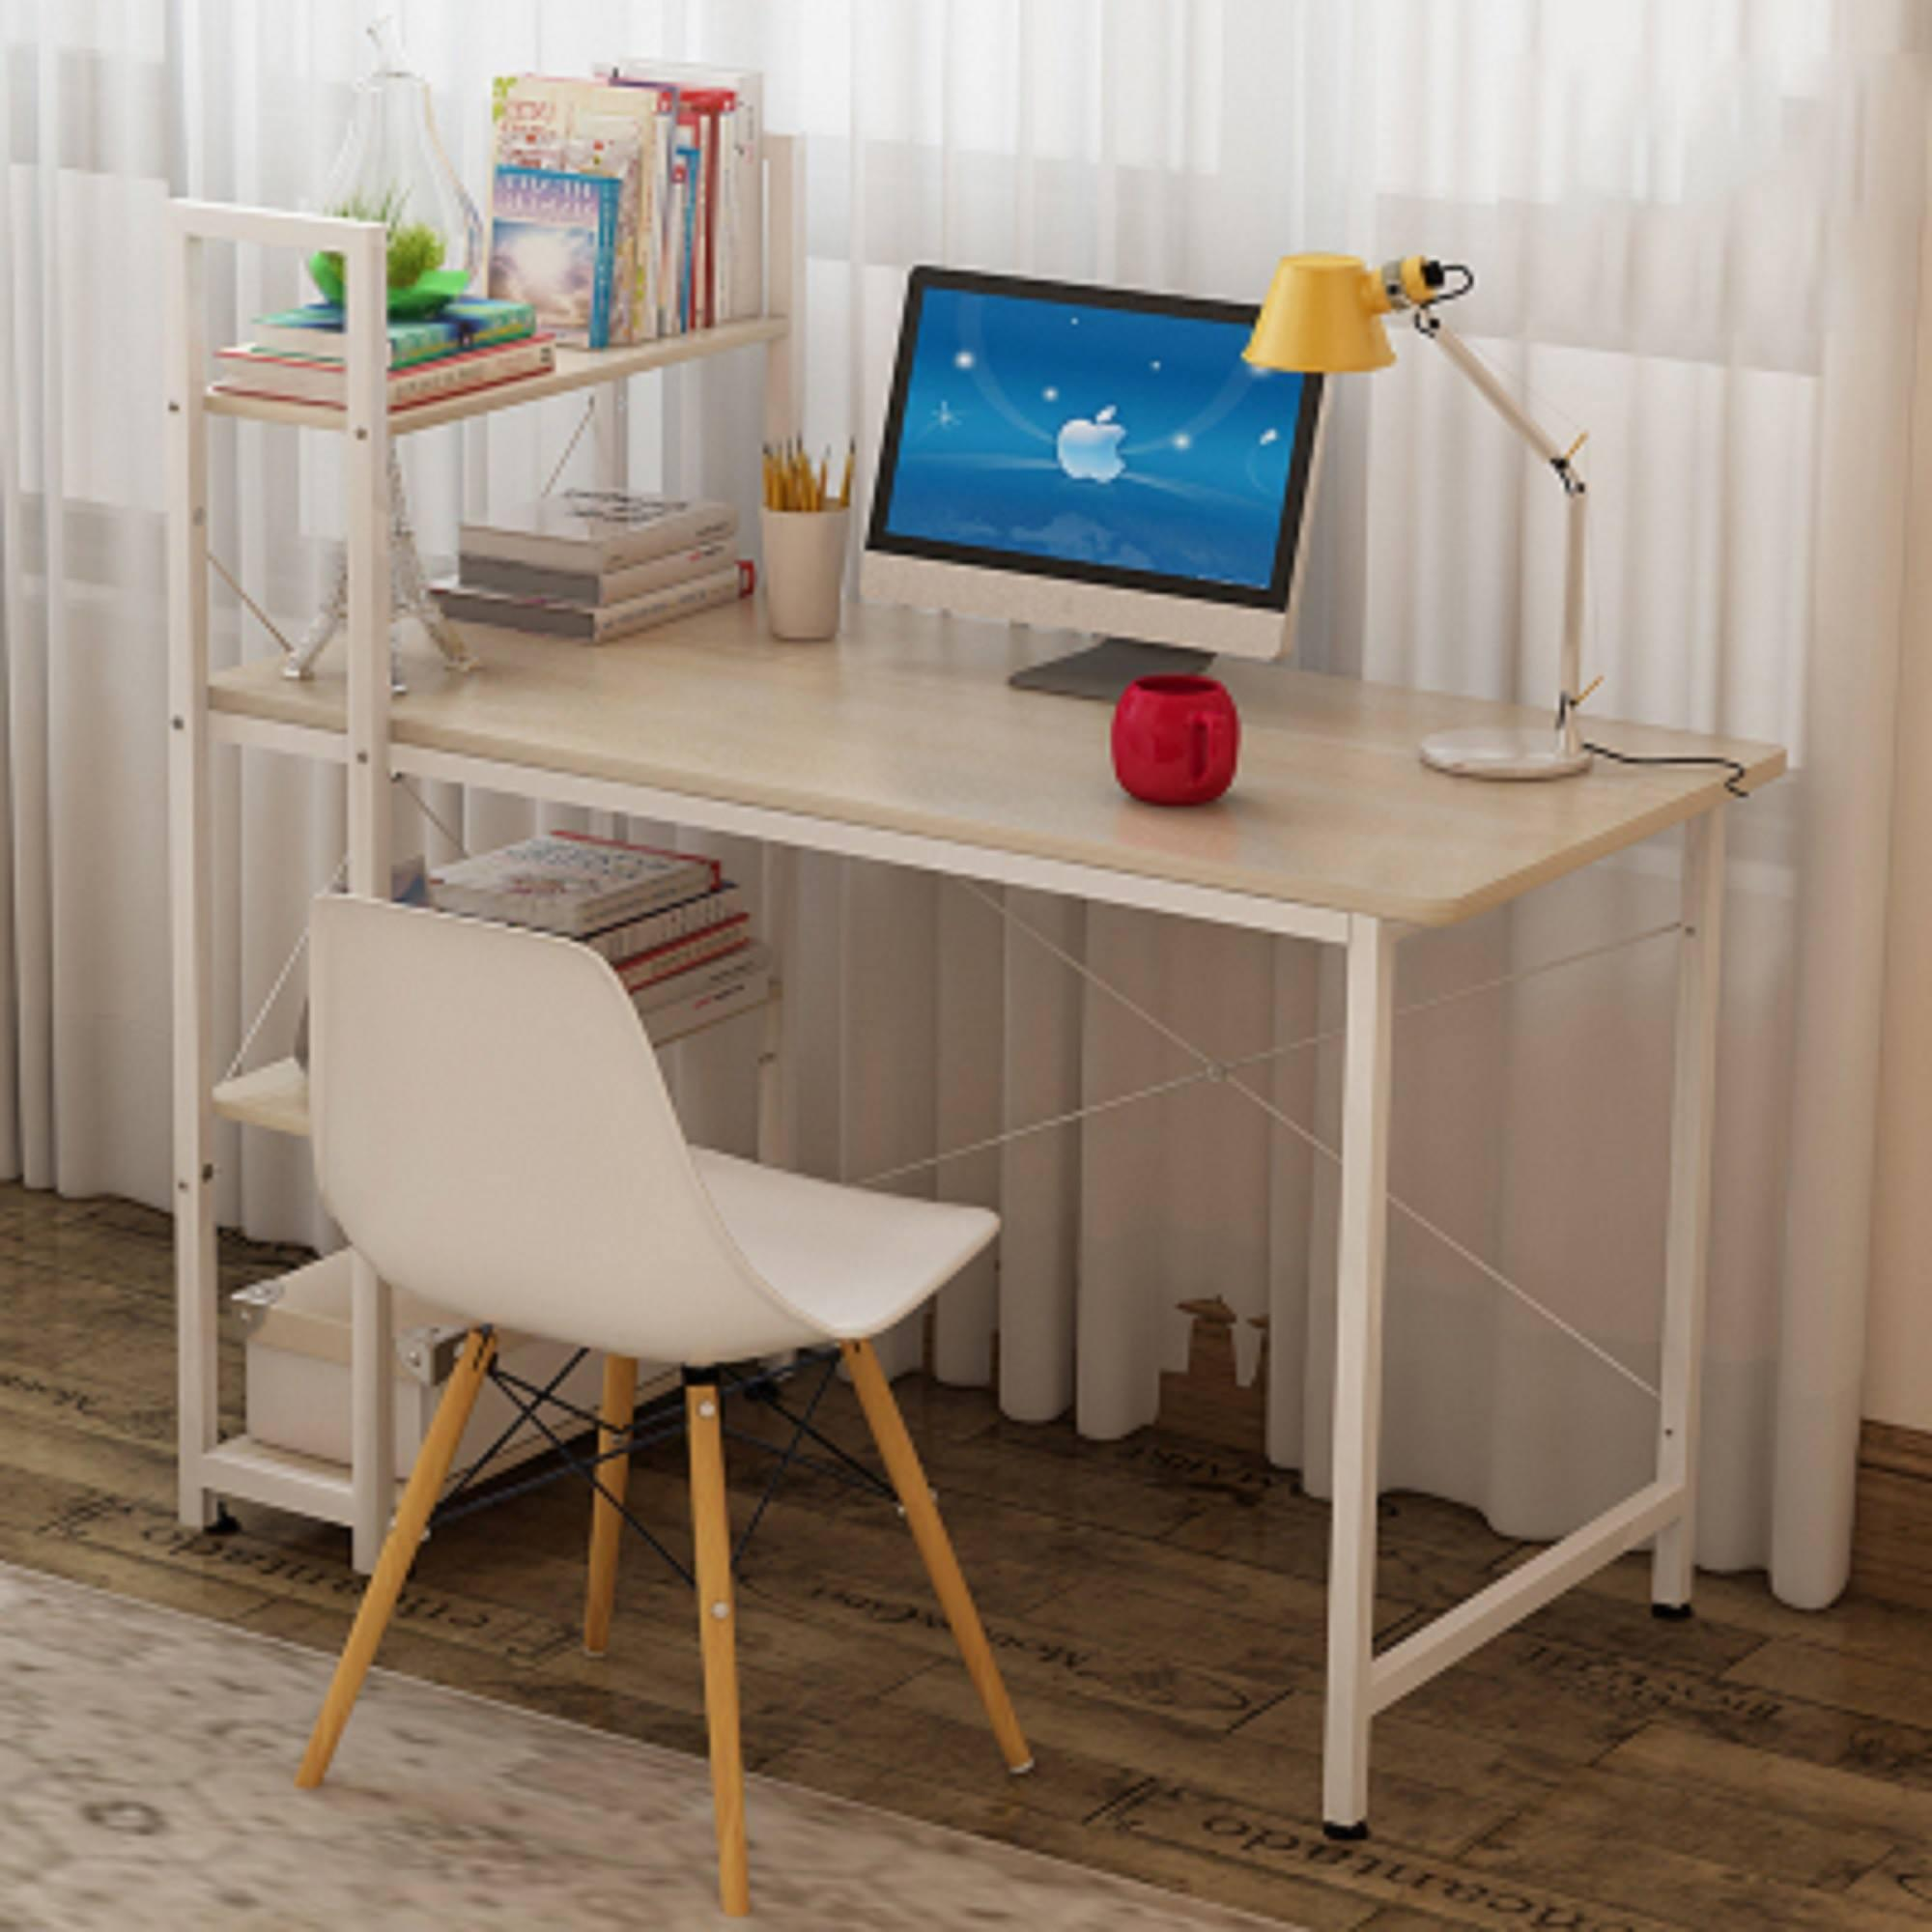 office desk table. clifton tb-60wm white maple wood 60x120cm computer desk table office desk table